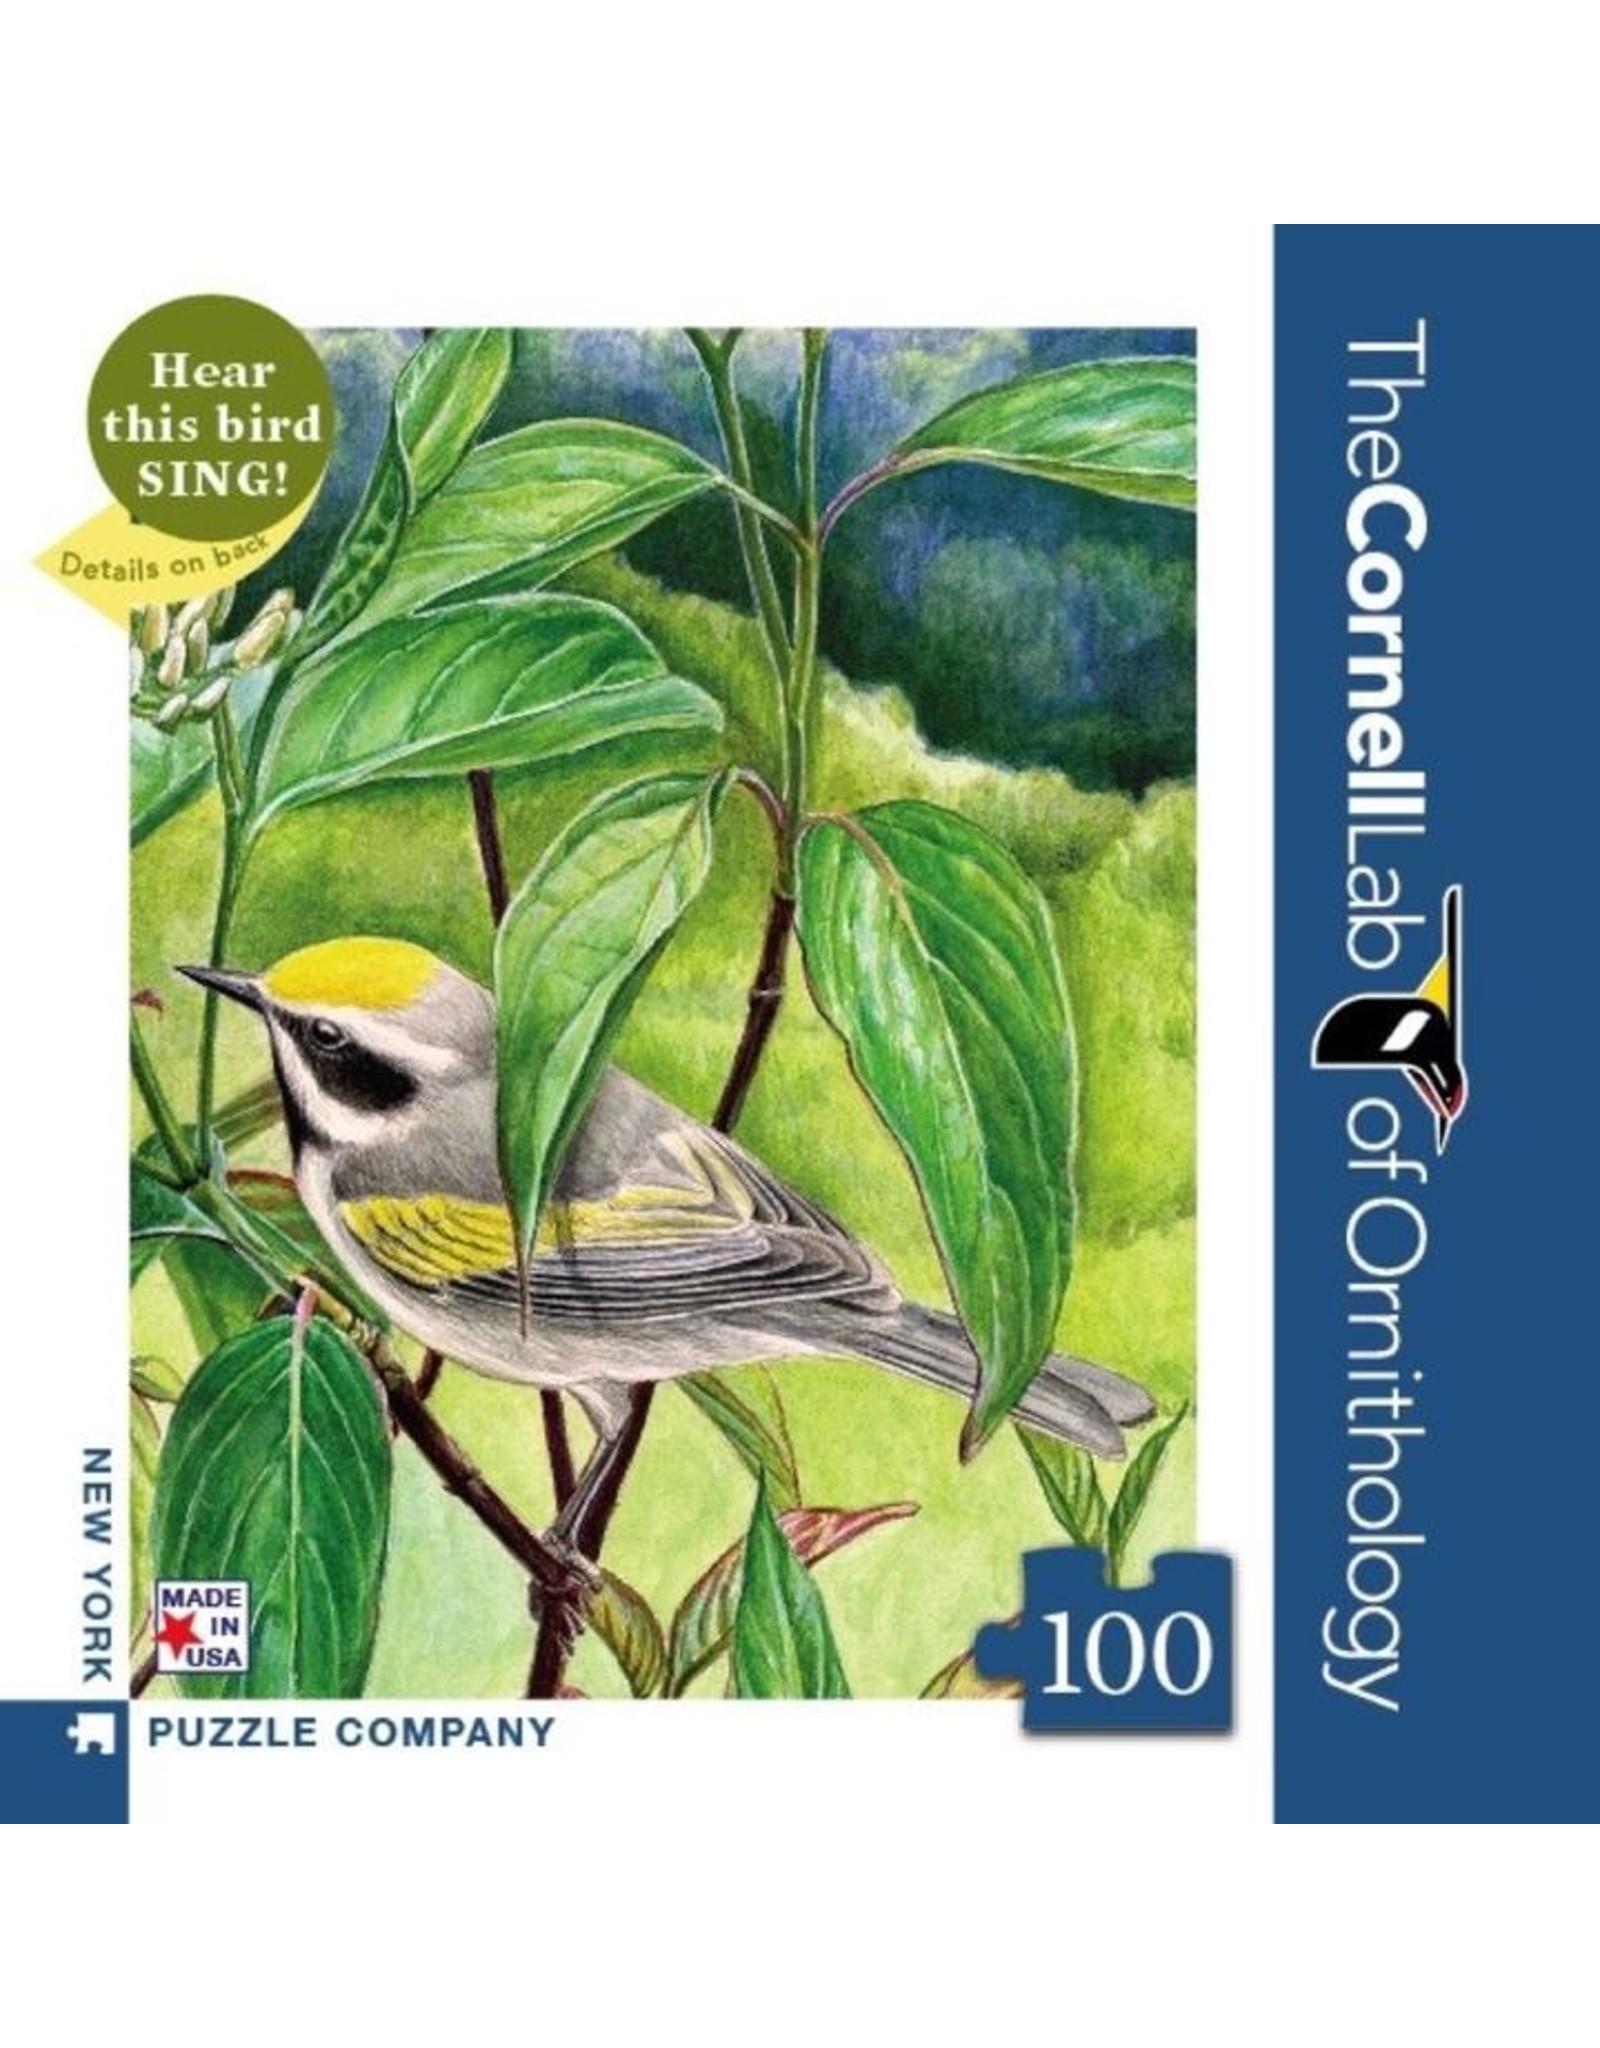 NLE - Mini Puzzle Golden-Winged Warbler / 100pcs